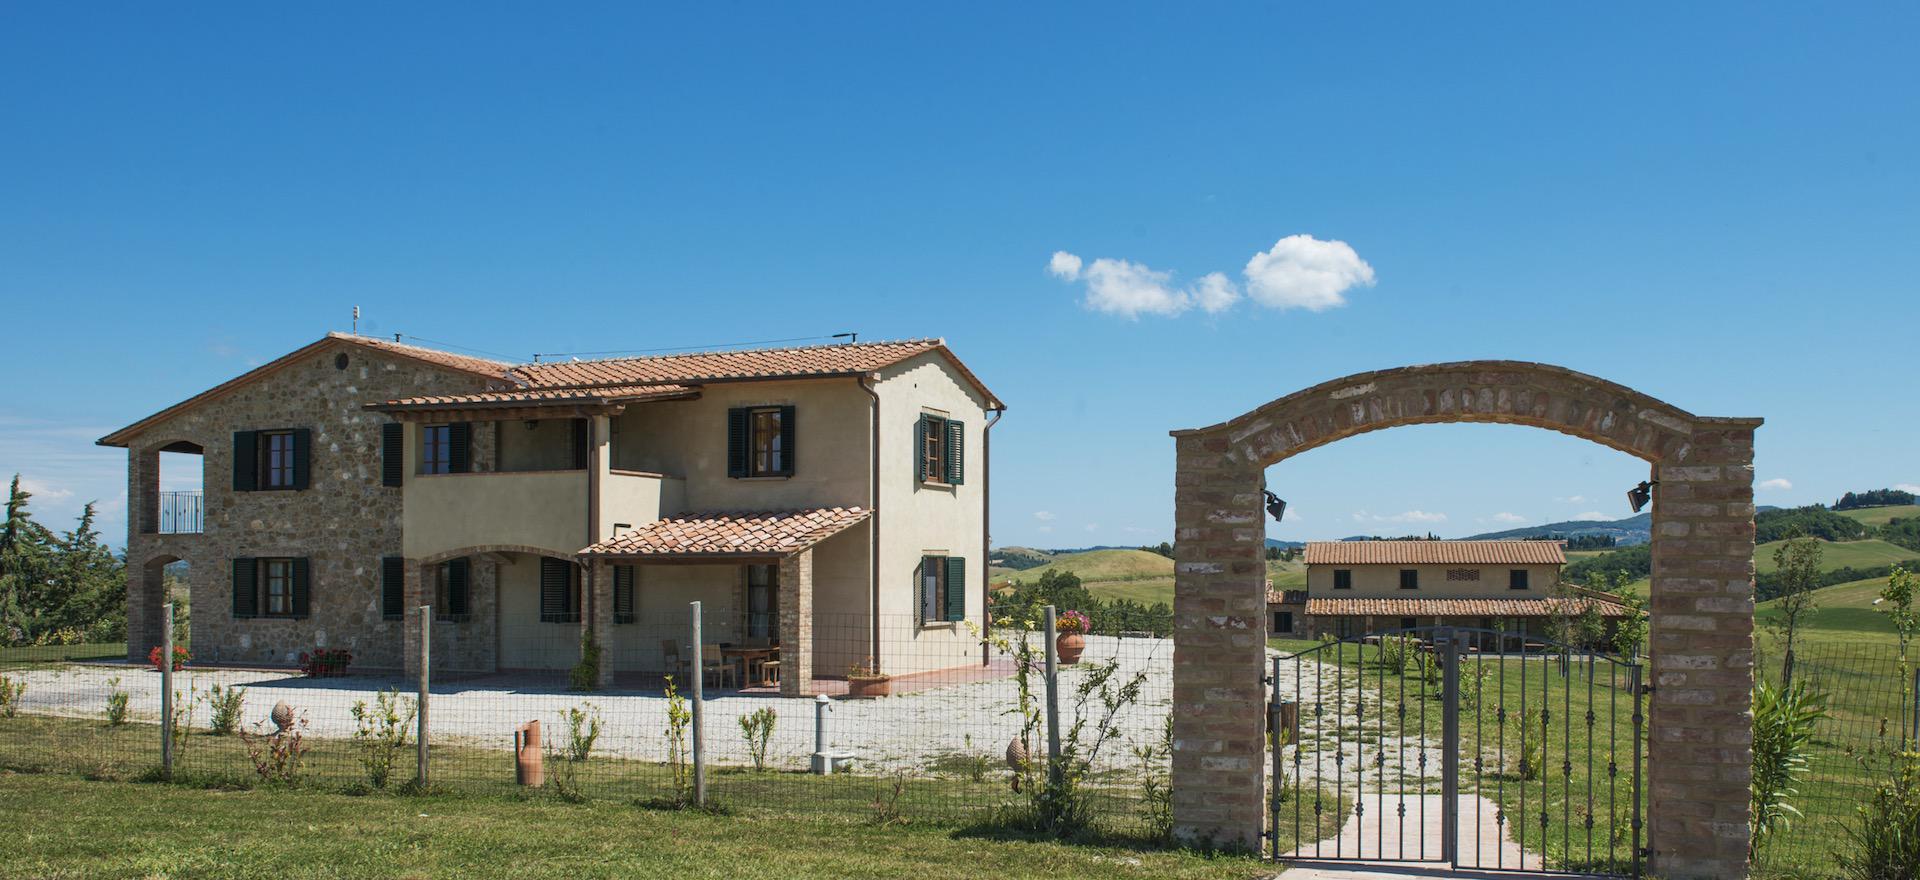 Agriturismo Toscane Familie-vriendelijke agriturismo Toscane met mooi zwembad